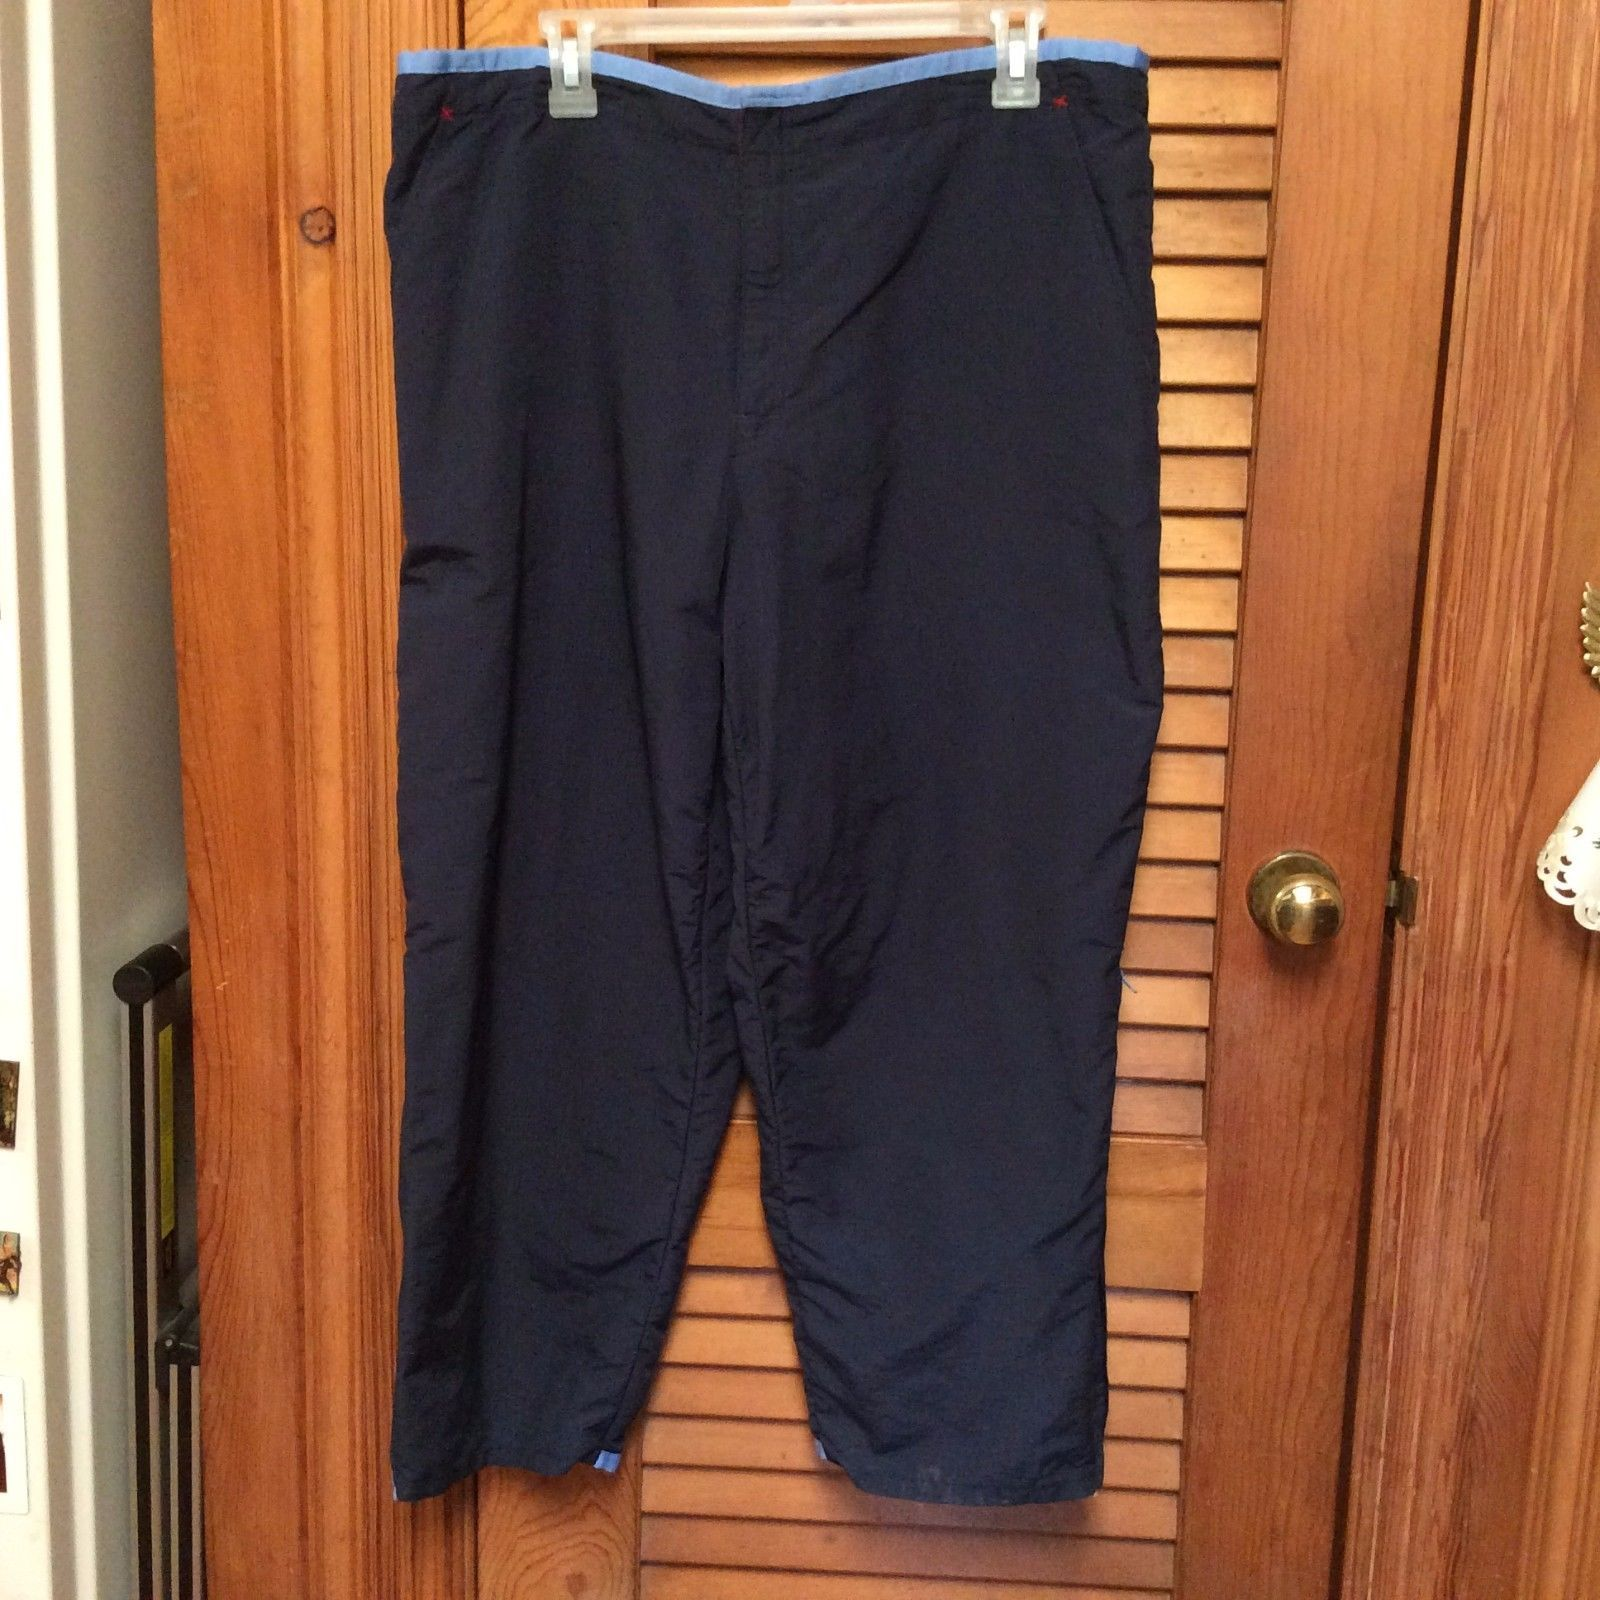 NEW Tangerine Ladies Two-fer Striped Yoga Athletic Shorts Black Size Large